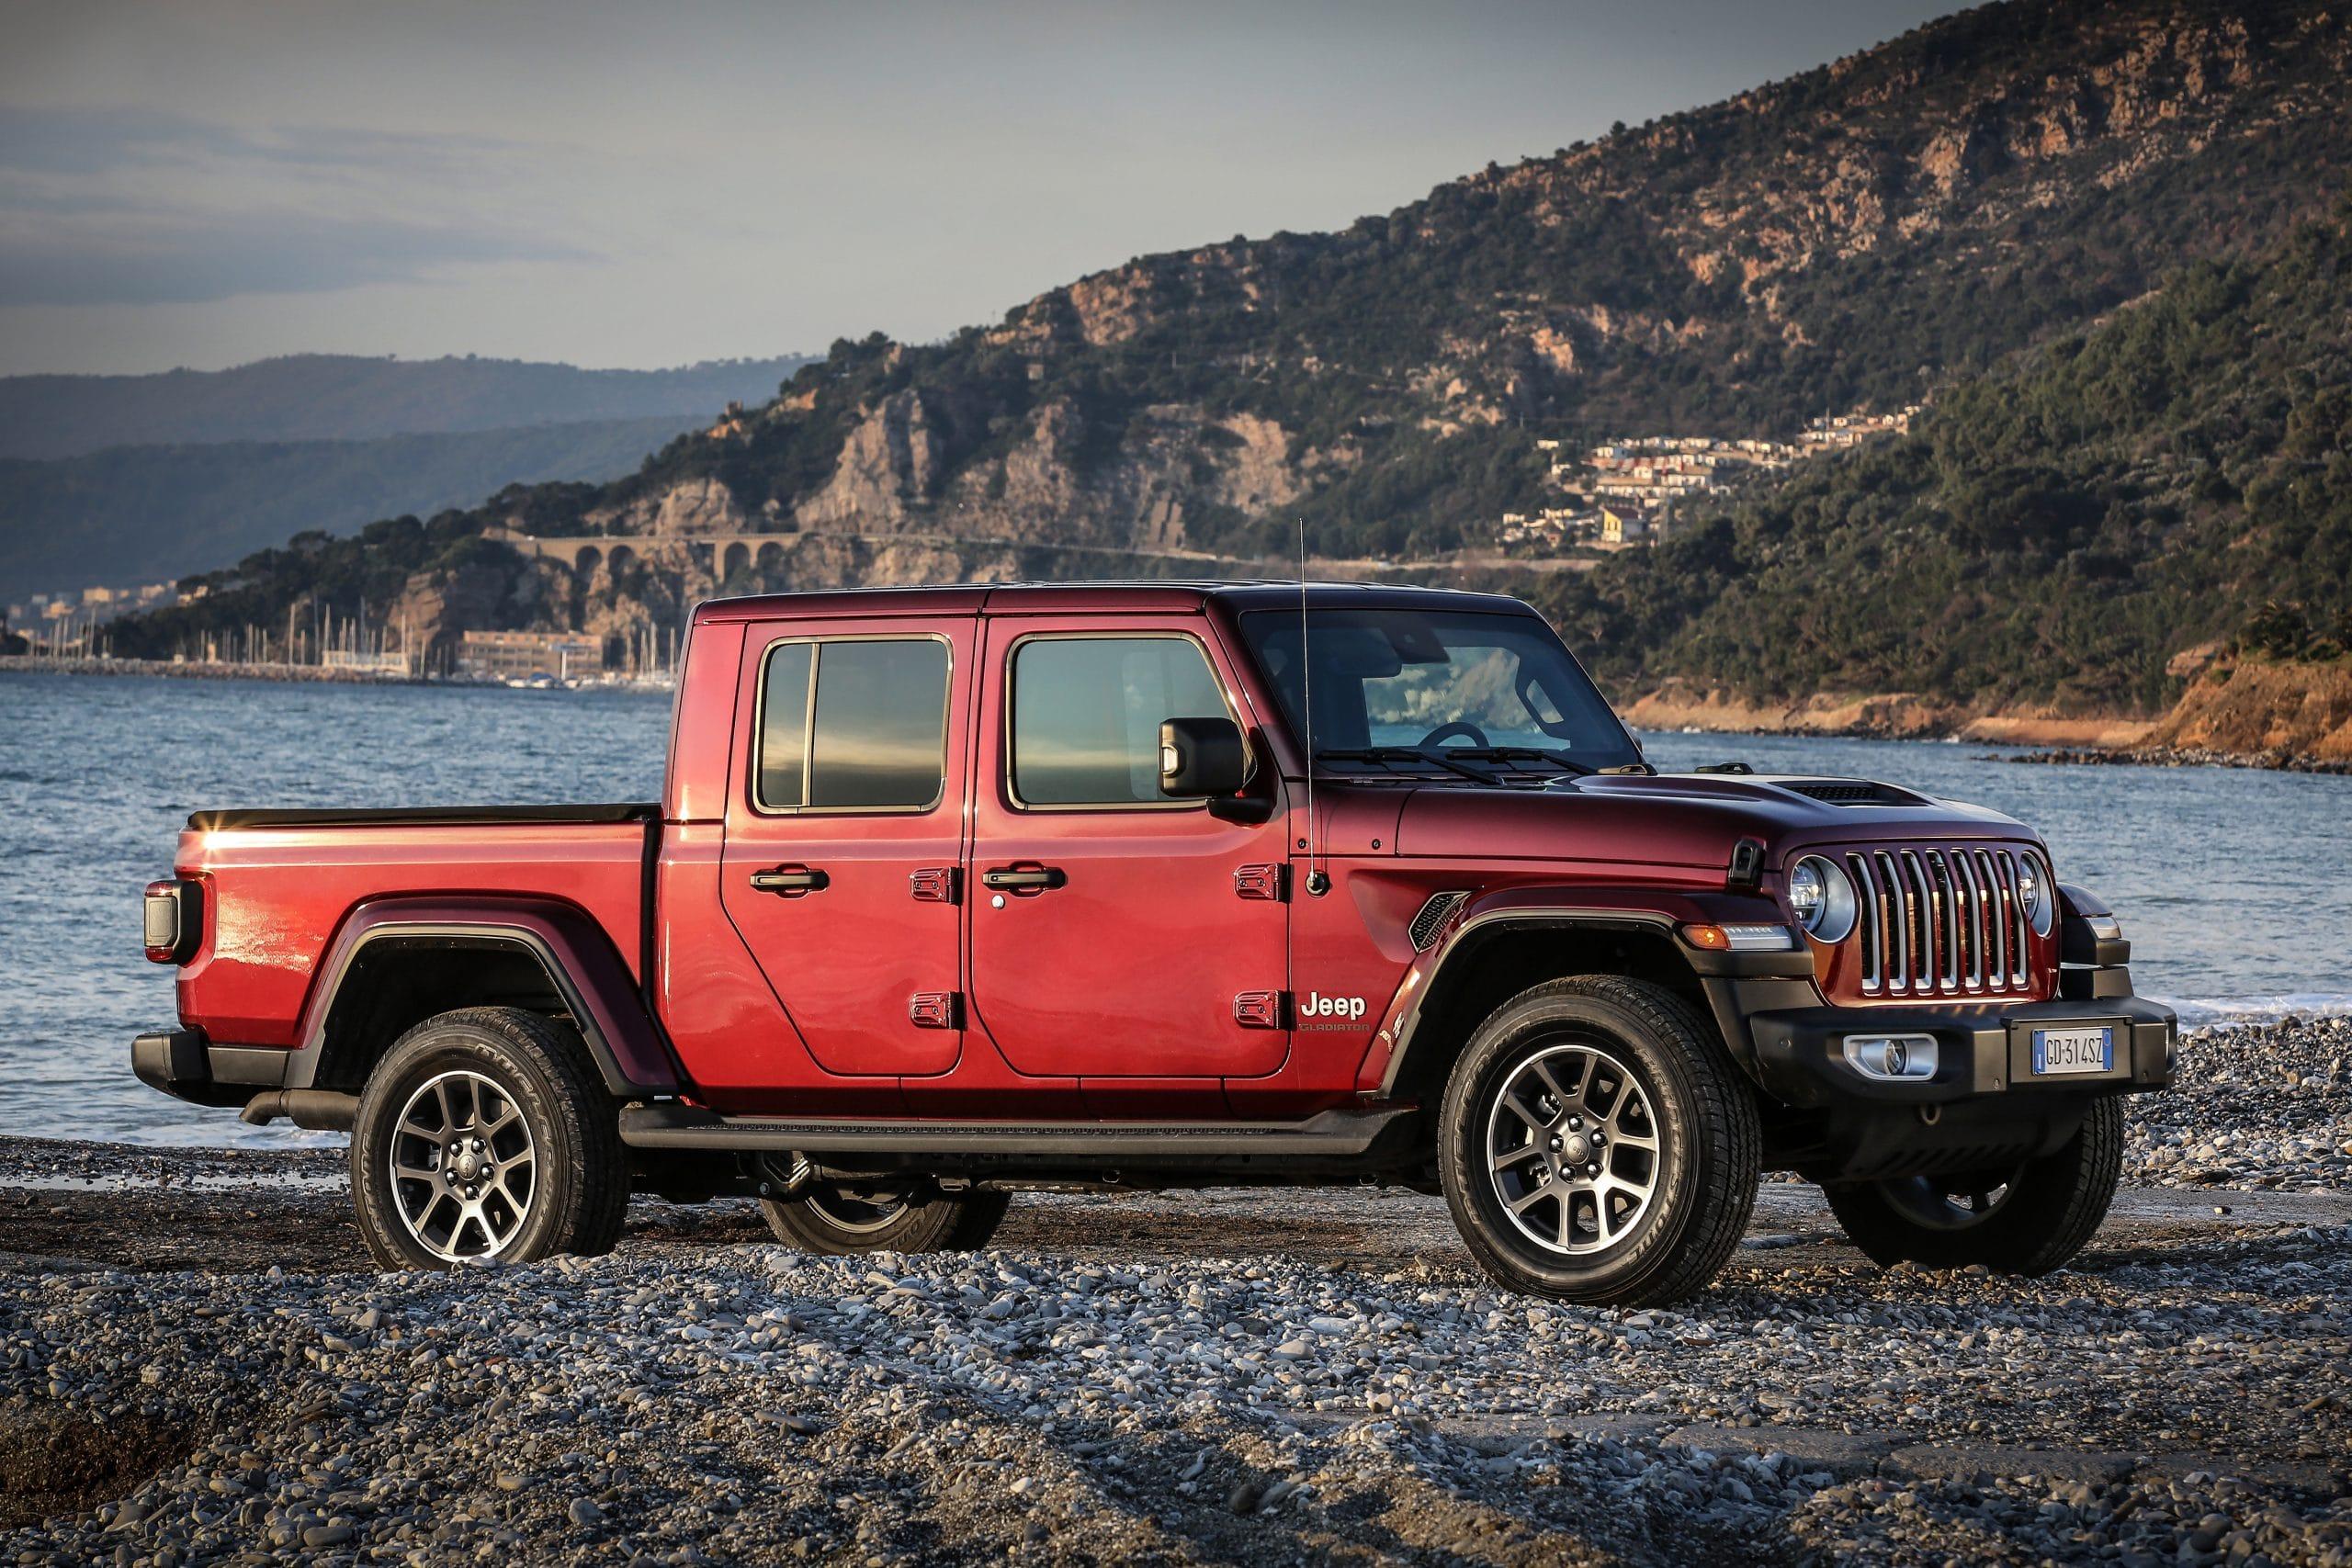 FOTO 03 scaled H Jeep πρωταγωνιστεί στα φετινά OFF ROAD Magazine Awards Gladiator, Jeep, Jeep Compass, Jeep Gladiator, Jeep Renegade, Jeep Wrangler, Renegade, Wrangler, ειδήσεις, Νέα